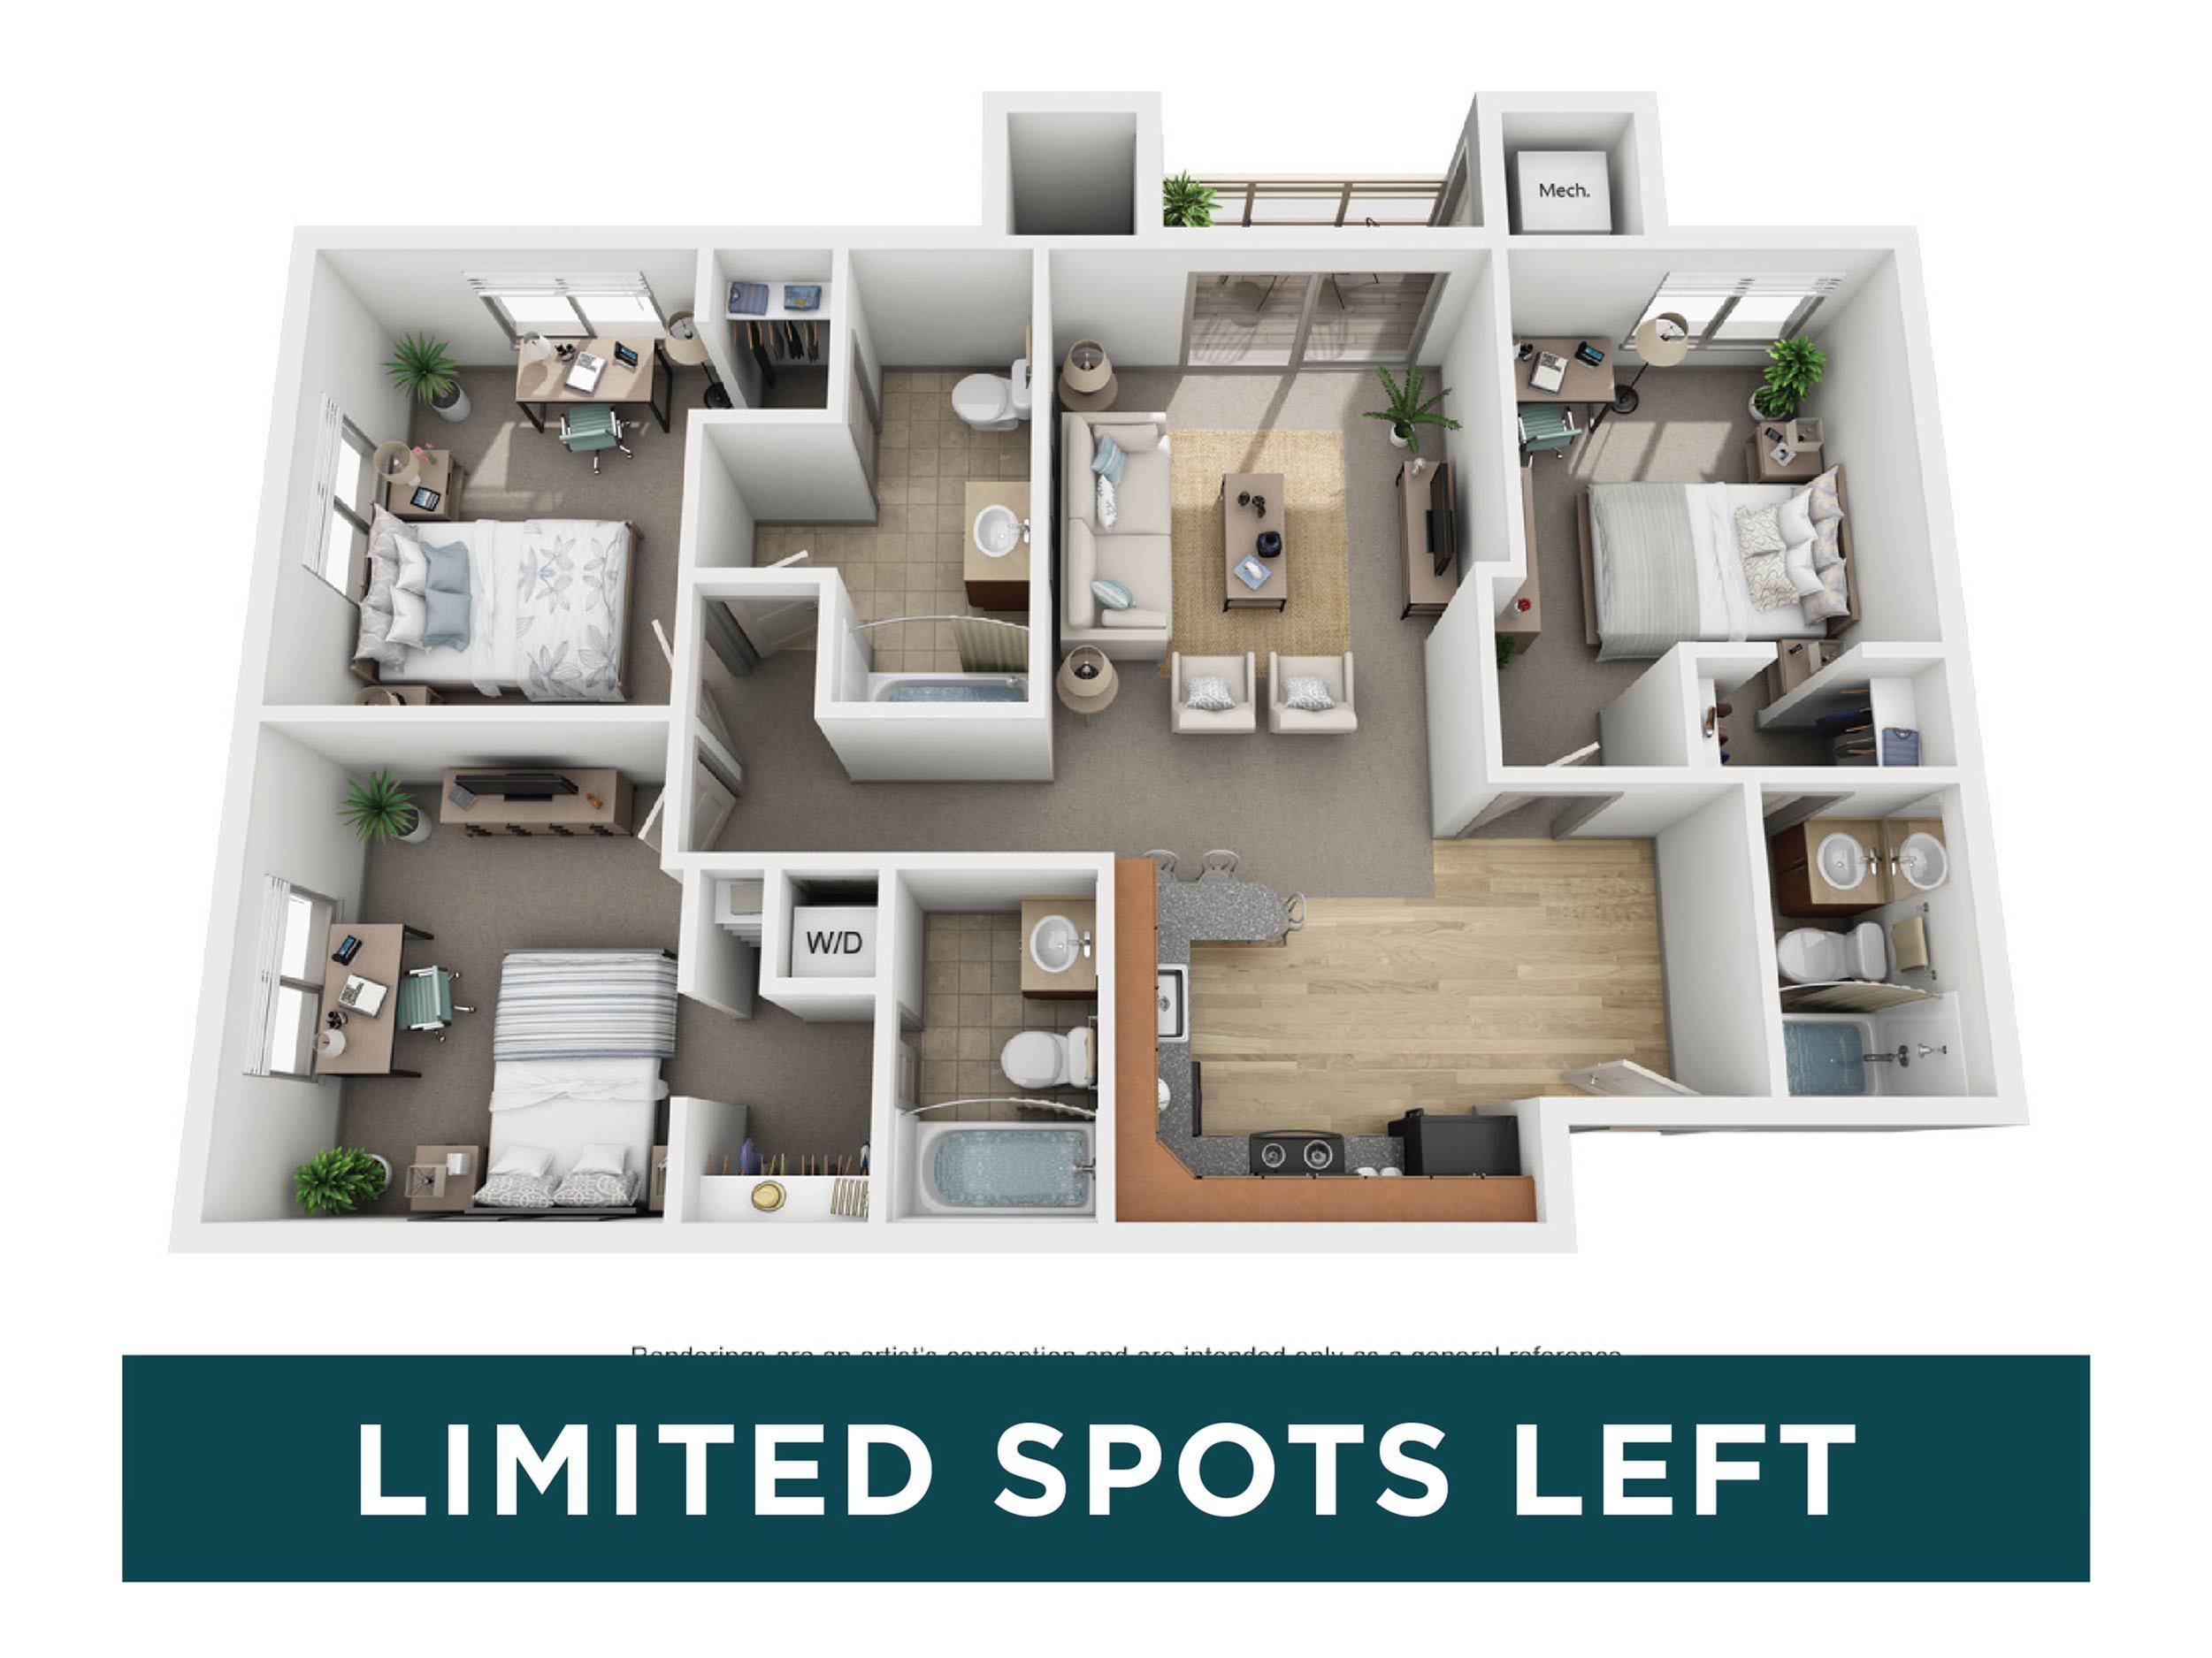 3b x 3b Mount Elbert - limited spots left